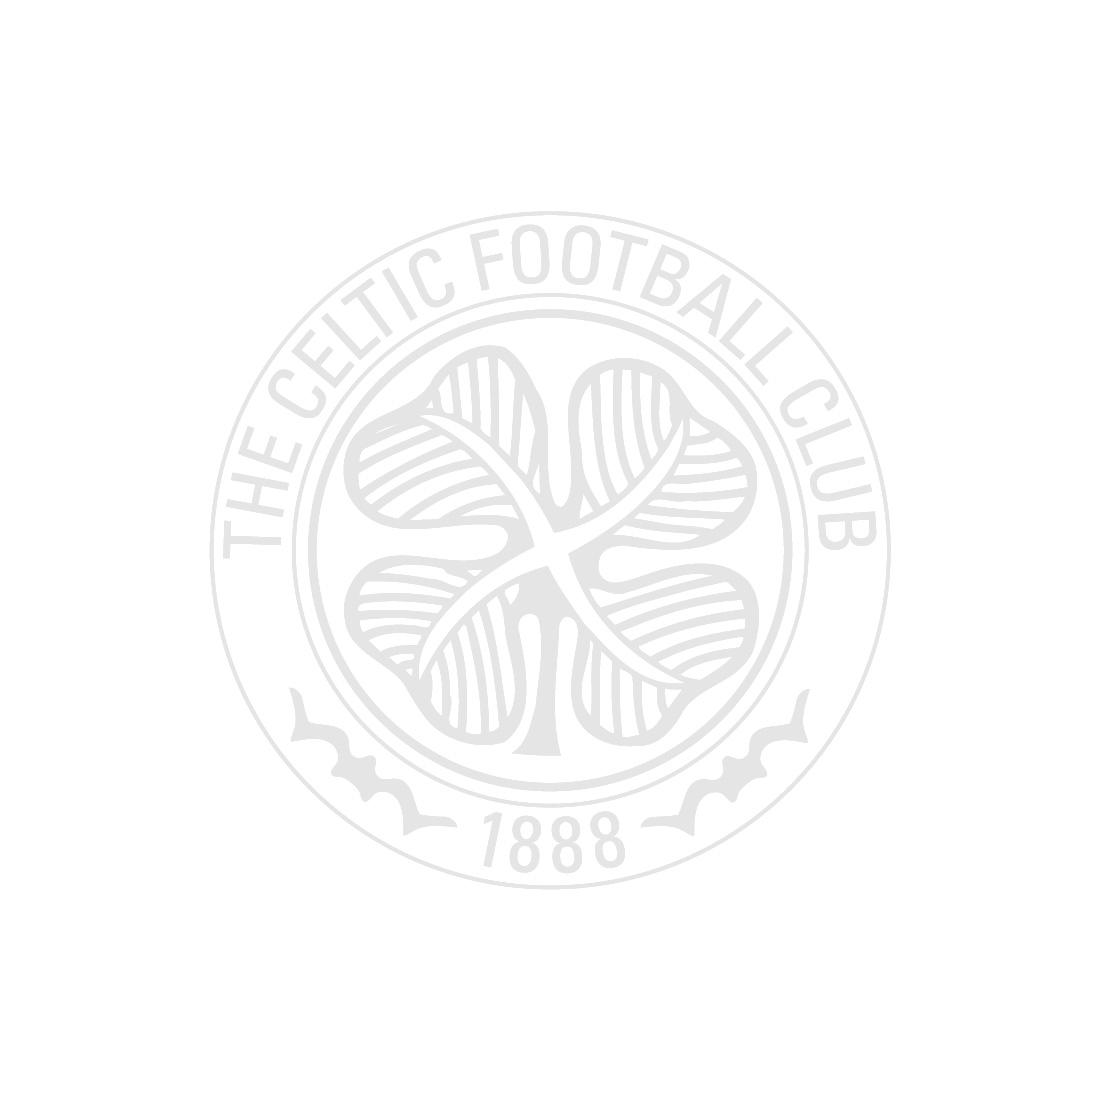 The Official Celtic Calendar 2020